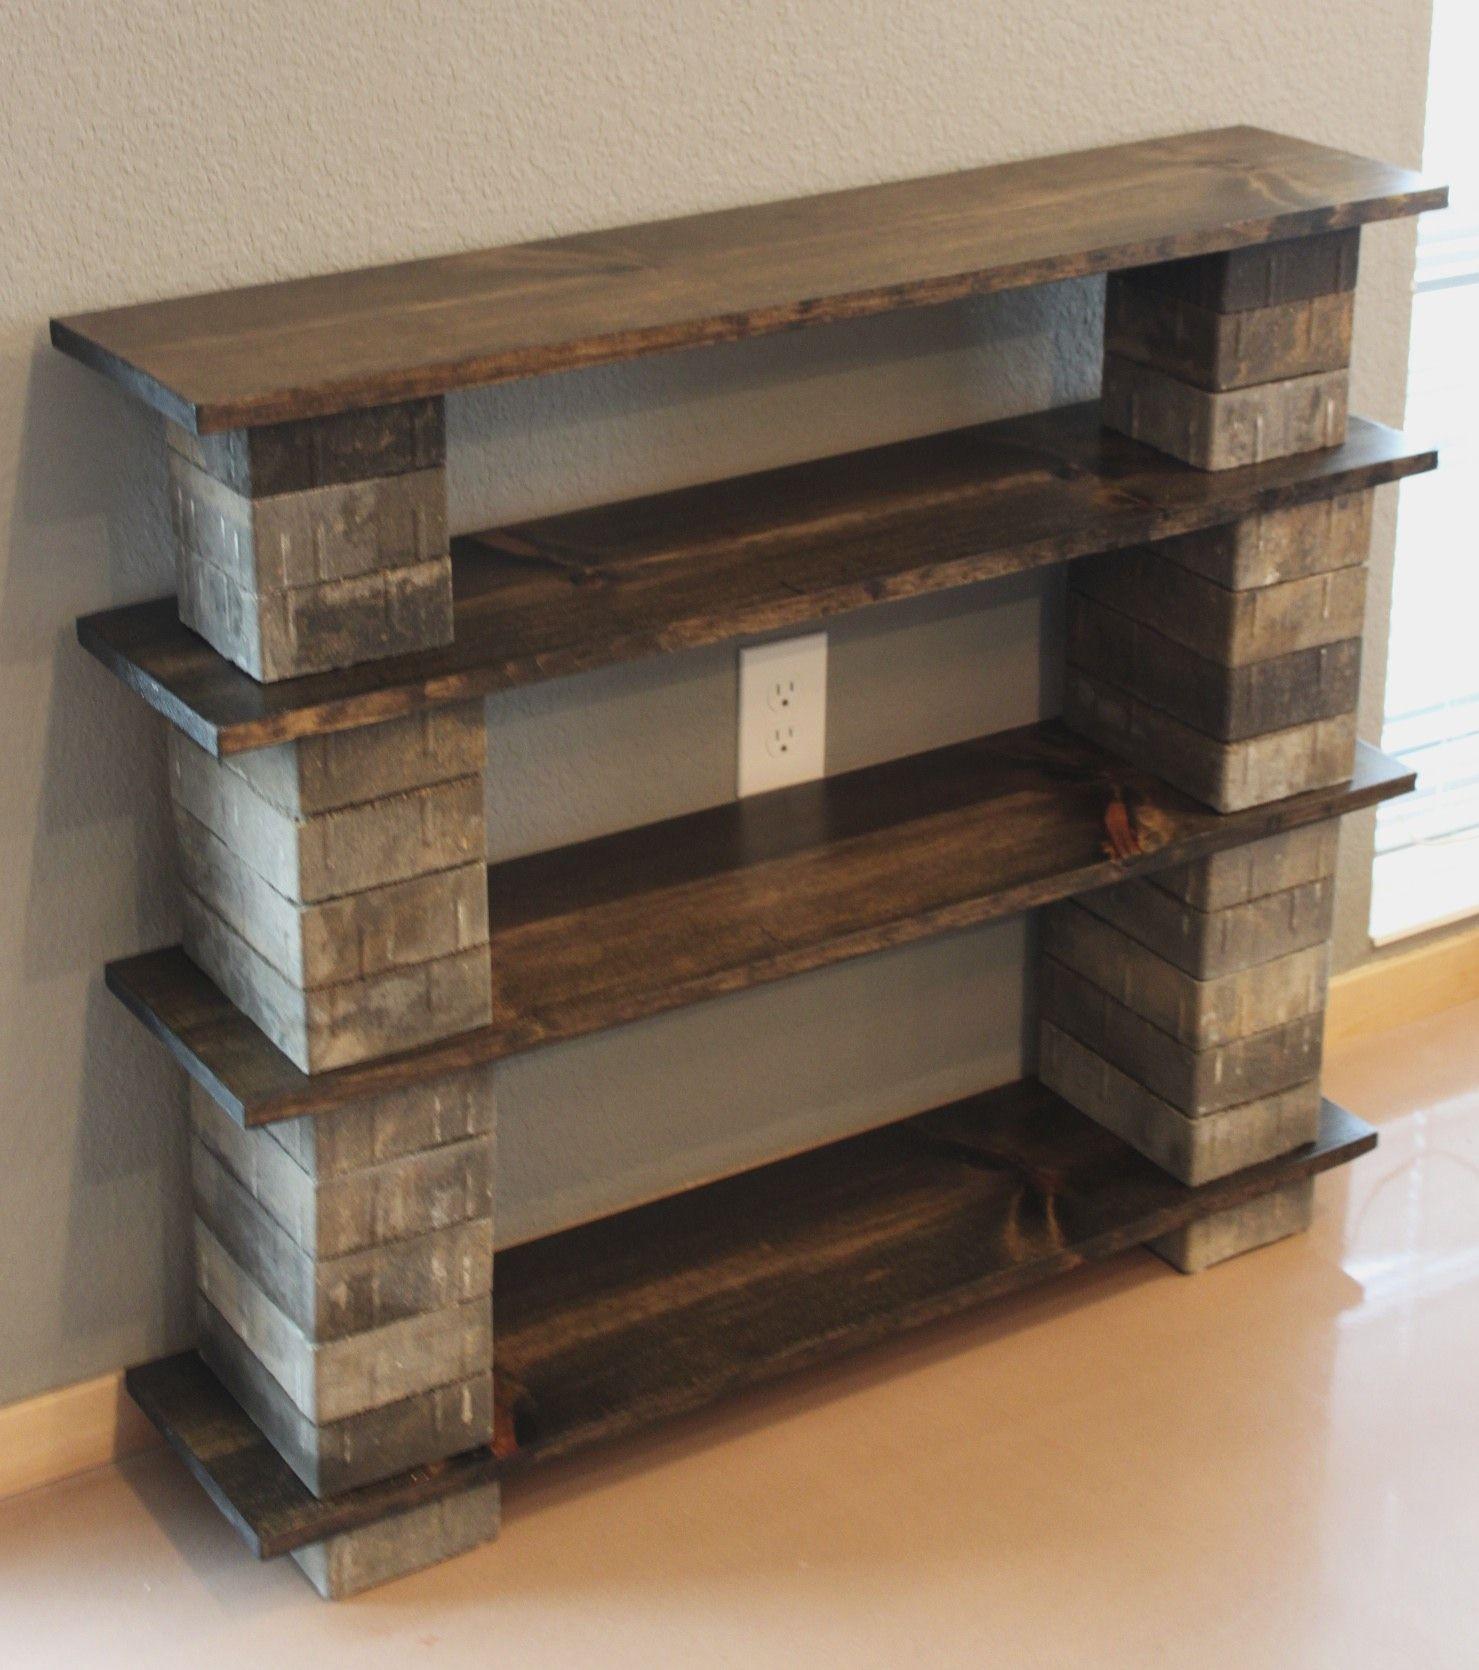 diy concrete block bookshelf | diy concrete, concrete and choices